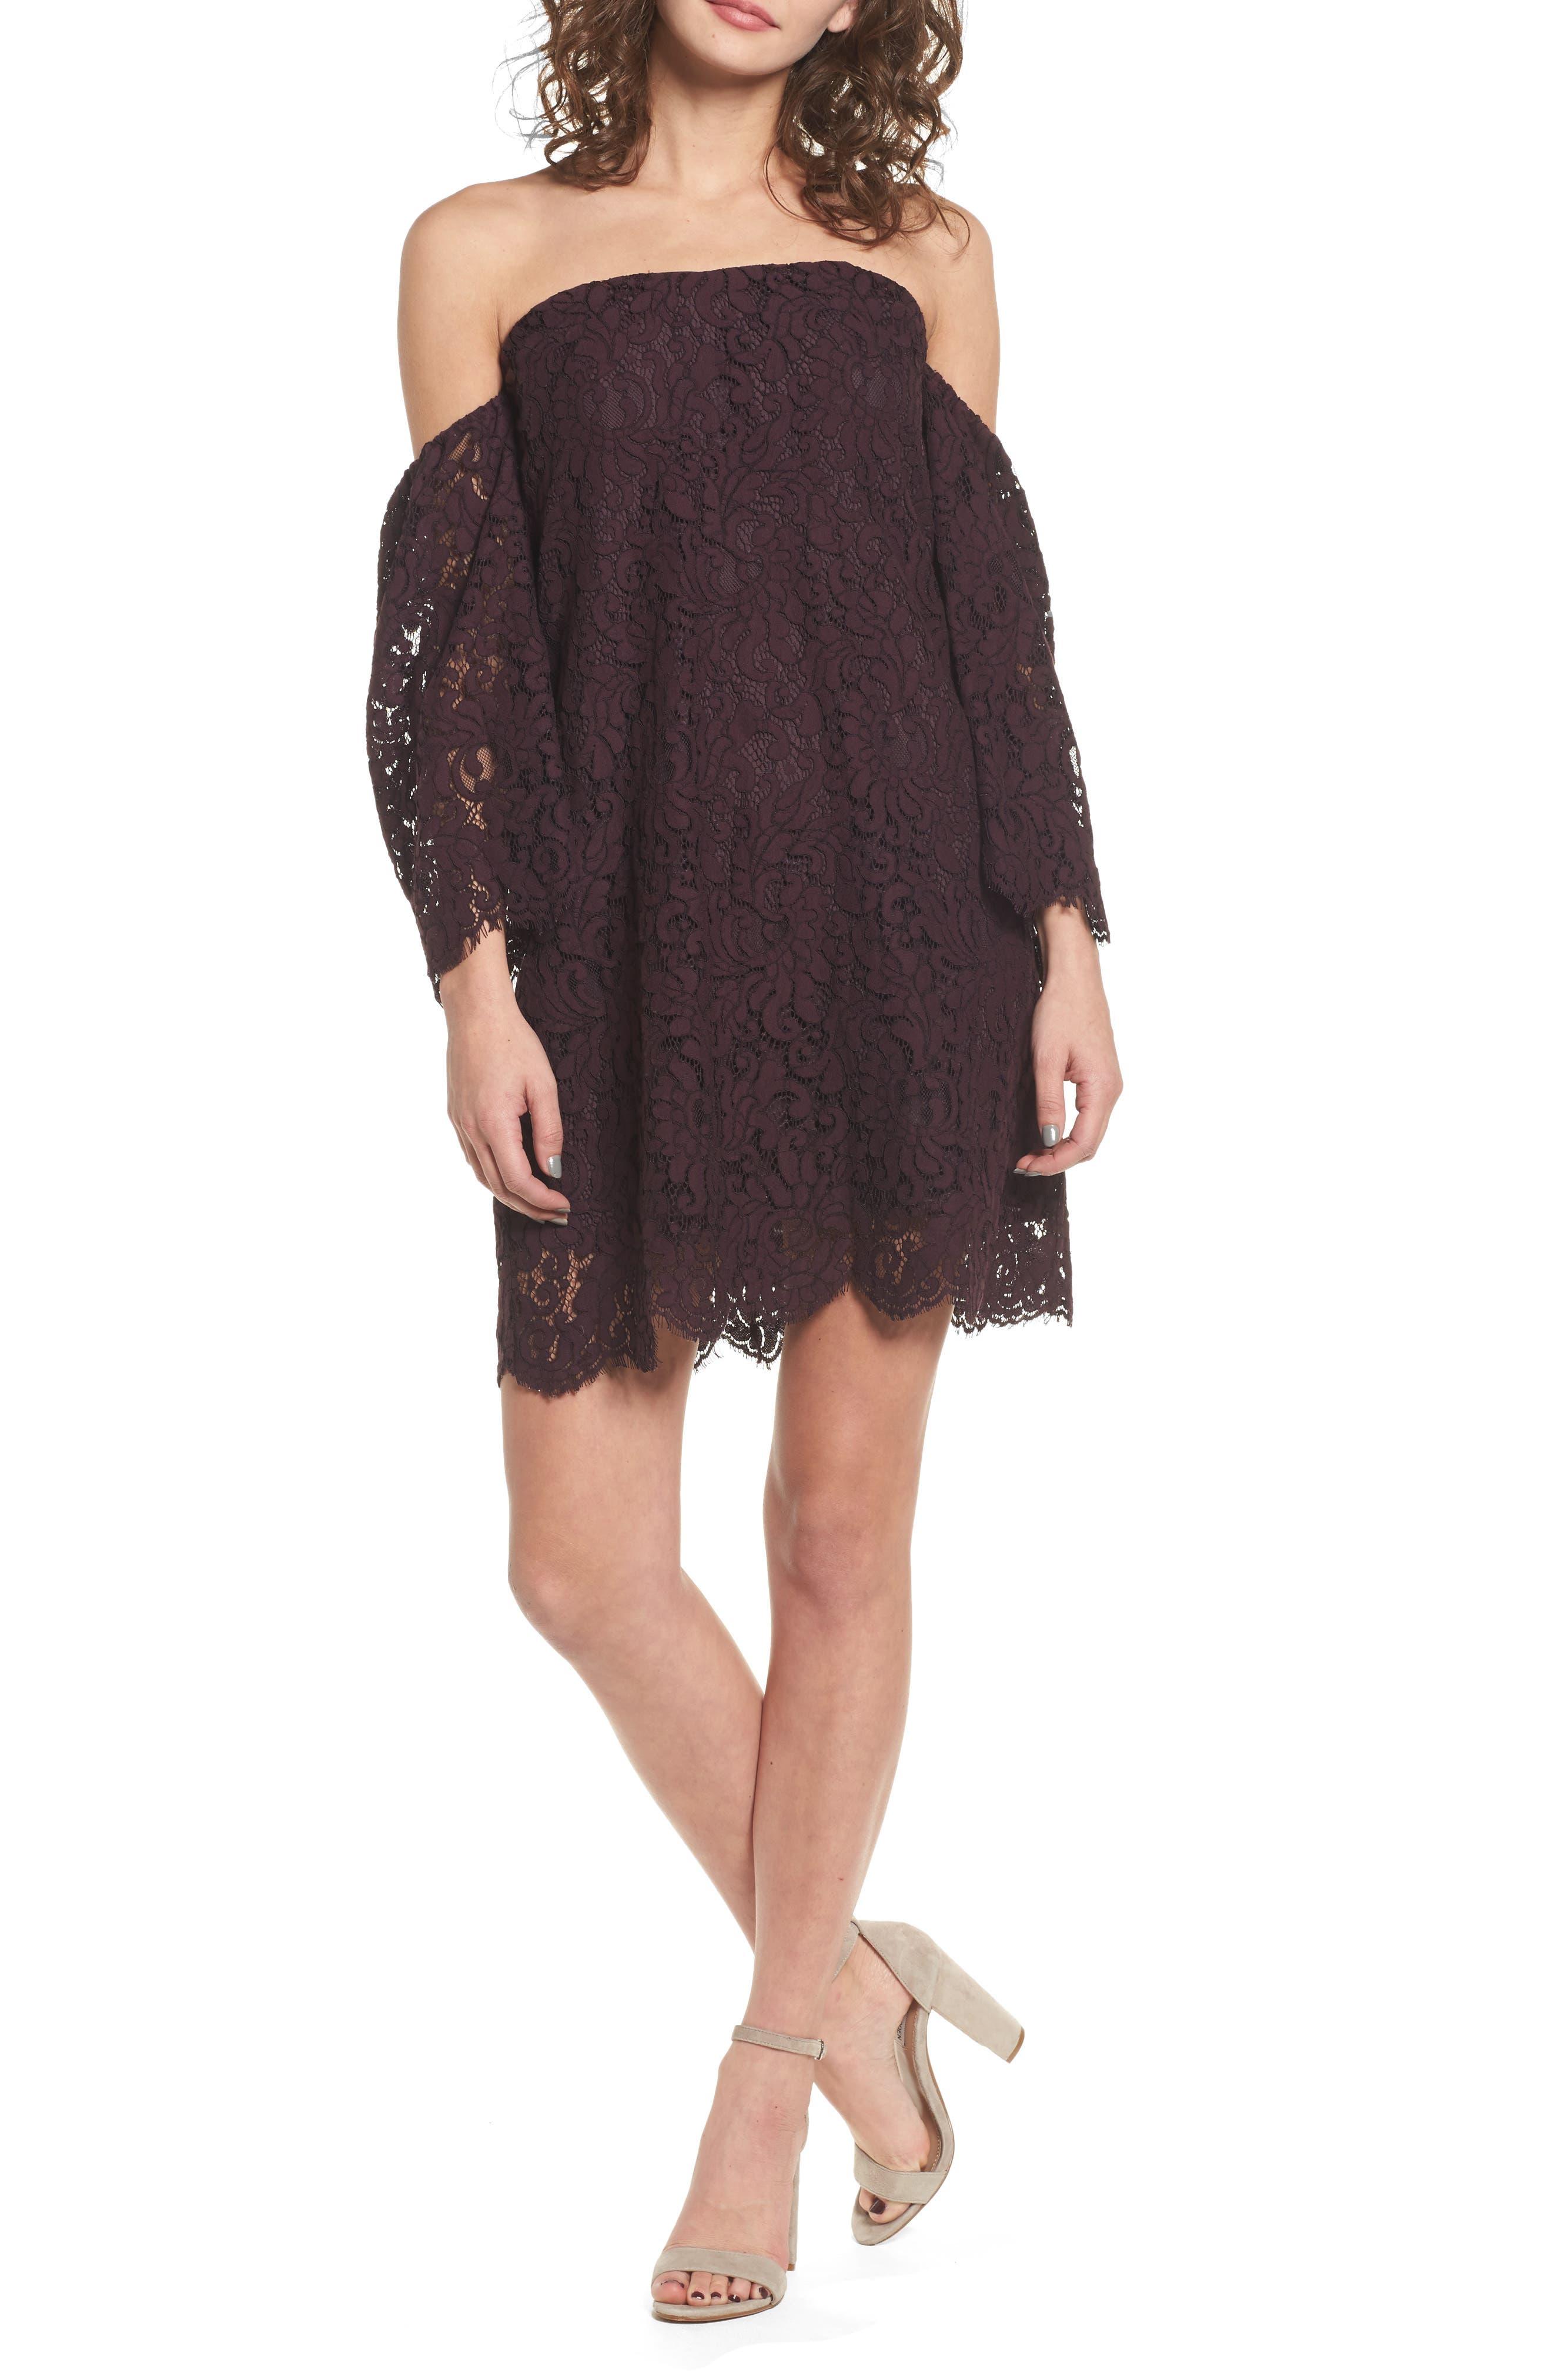 Adalira Off the Shoulder Lace Dress,                             Main thumbnail 1, color,                             930